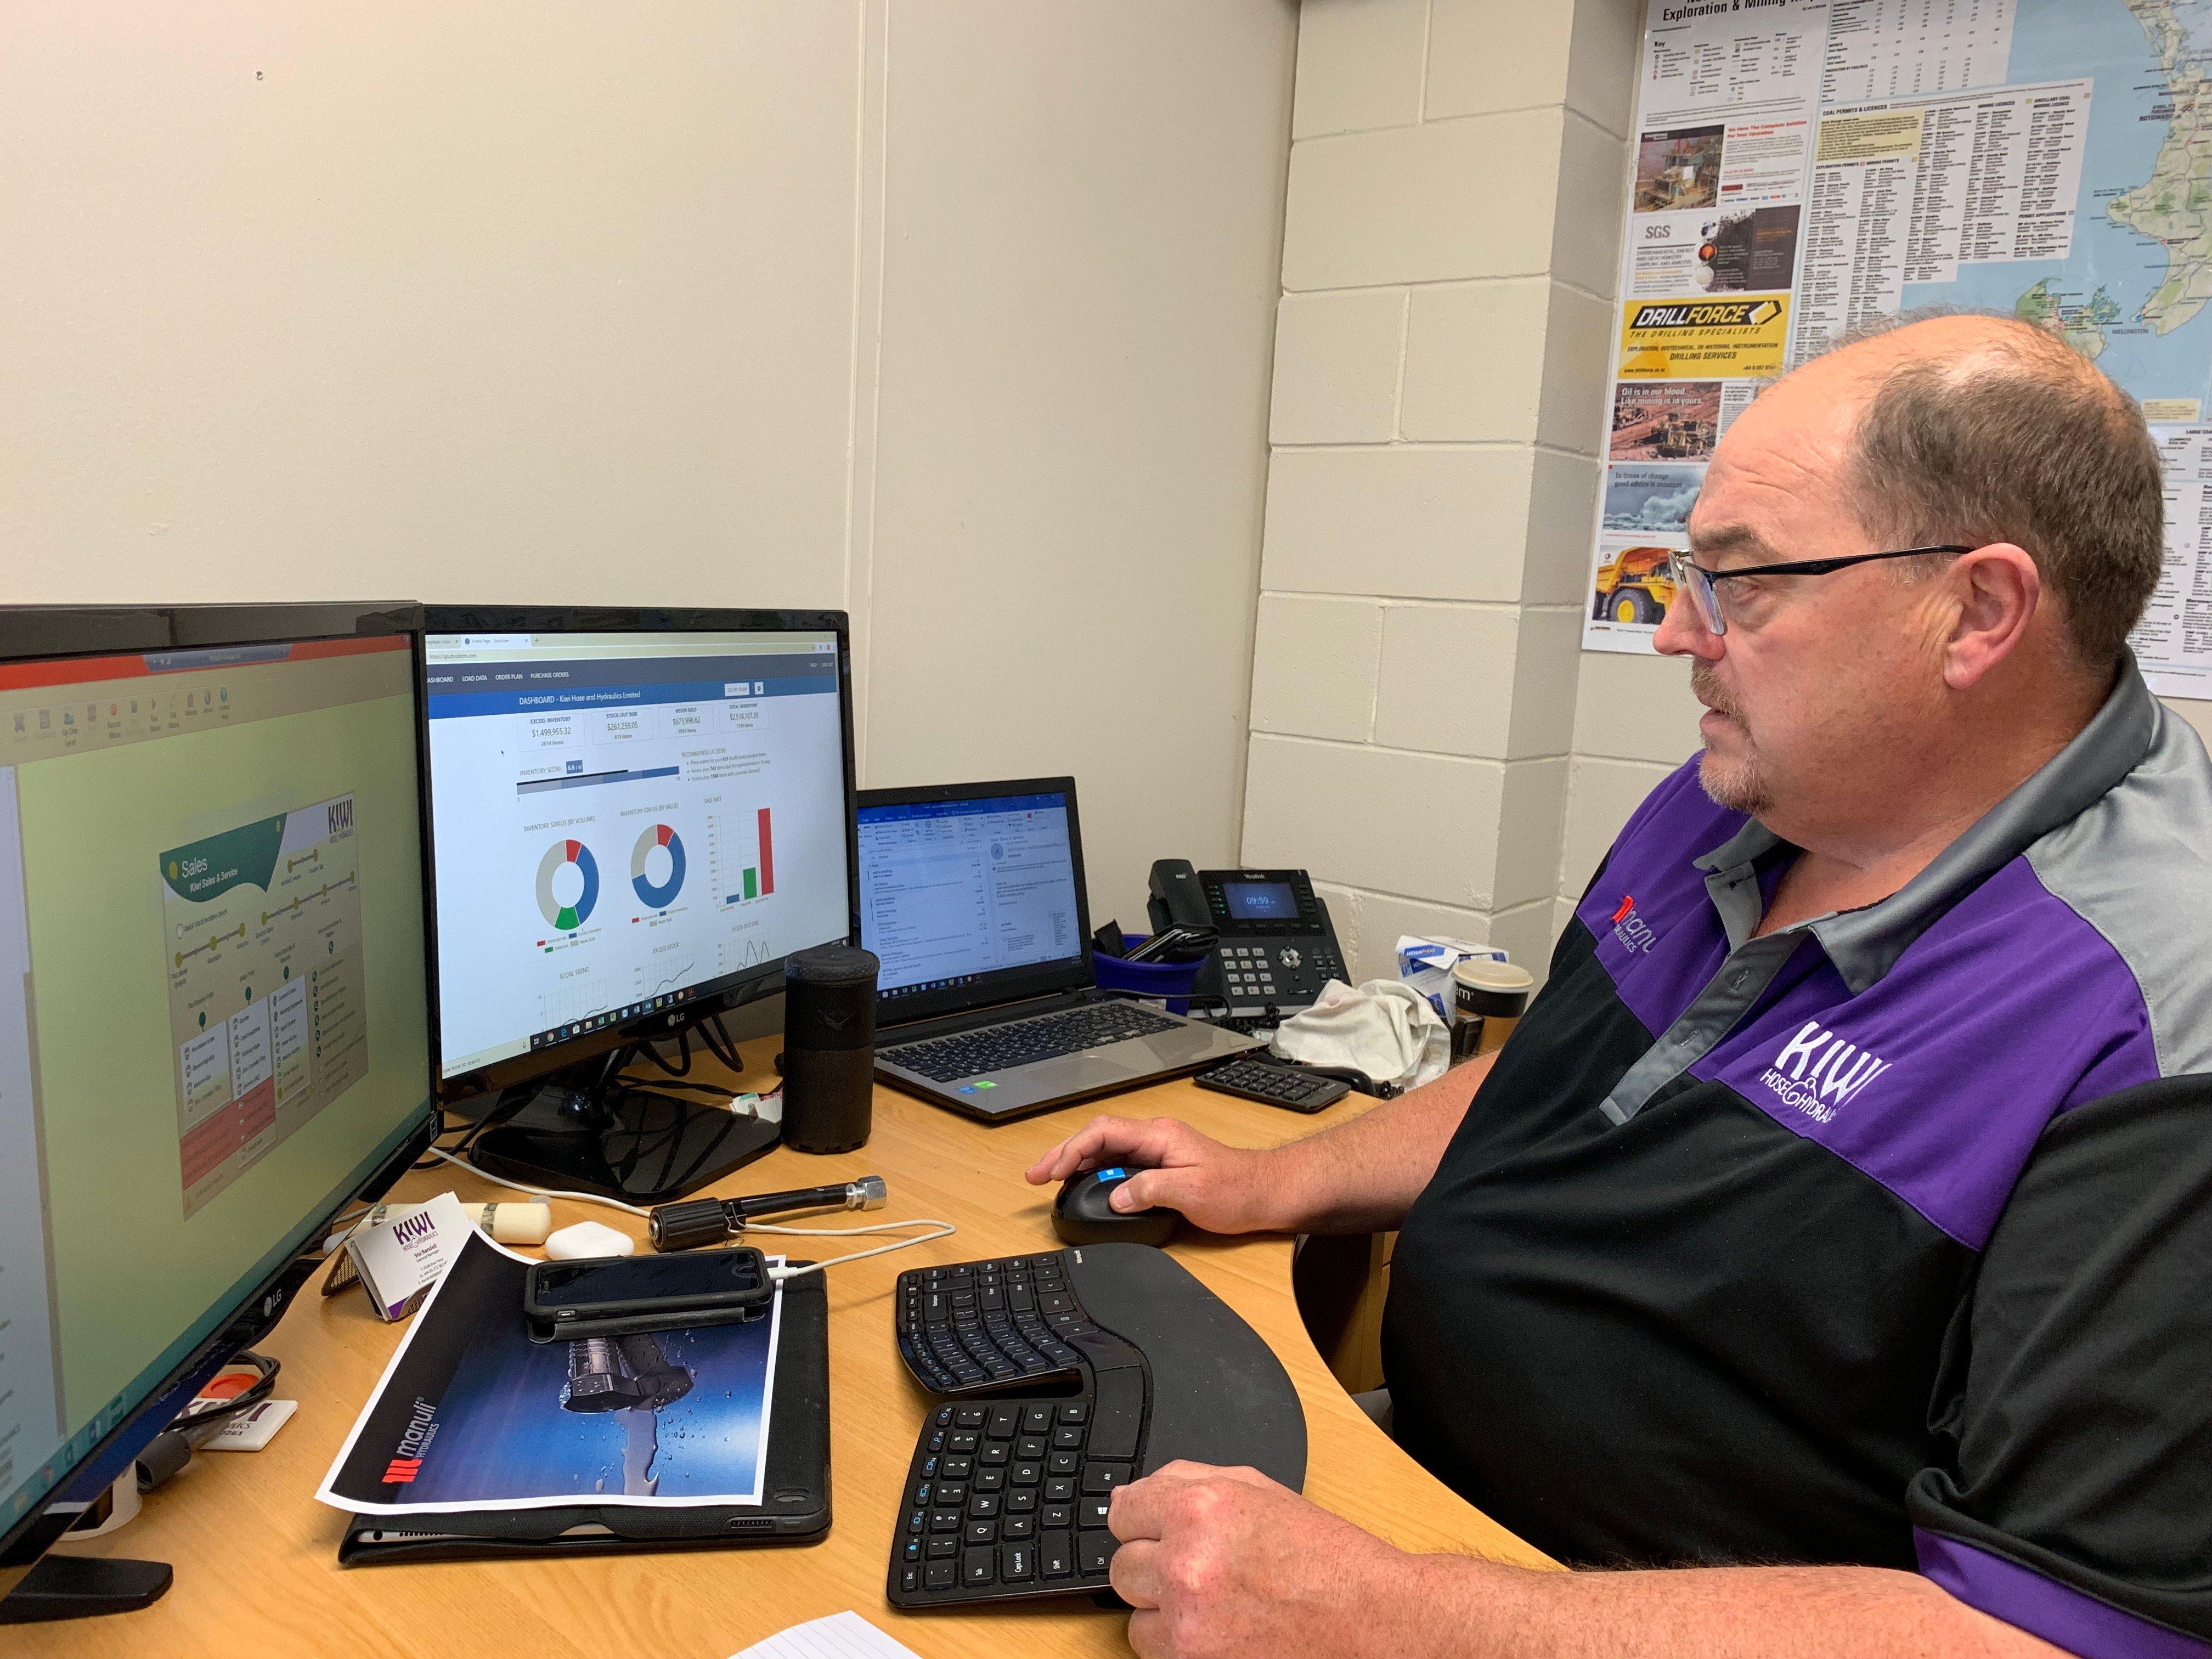 Stu Randell at Kiwi Hose & Hydraulics checks his inventory planning dashboard on StockTrim